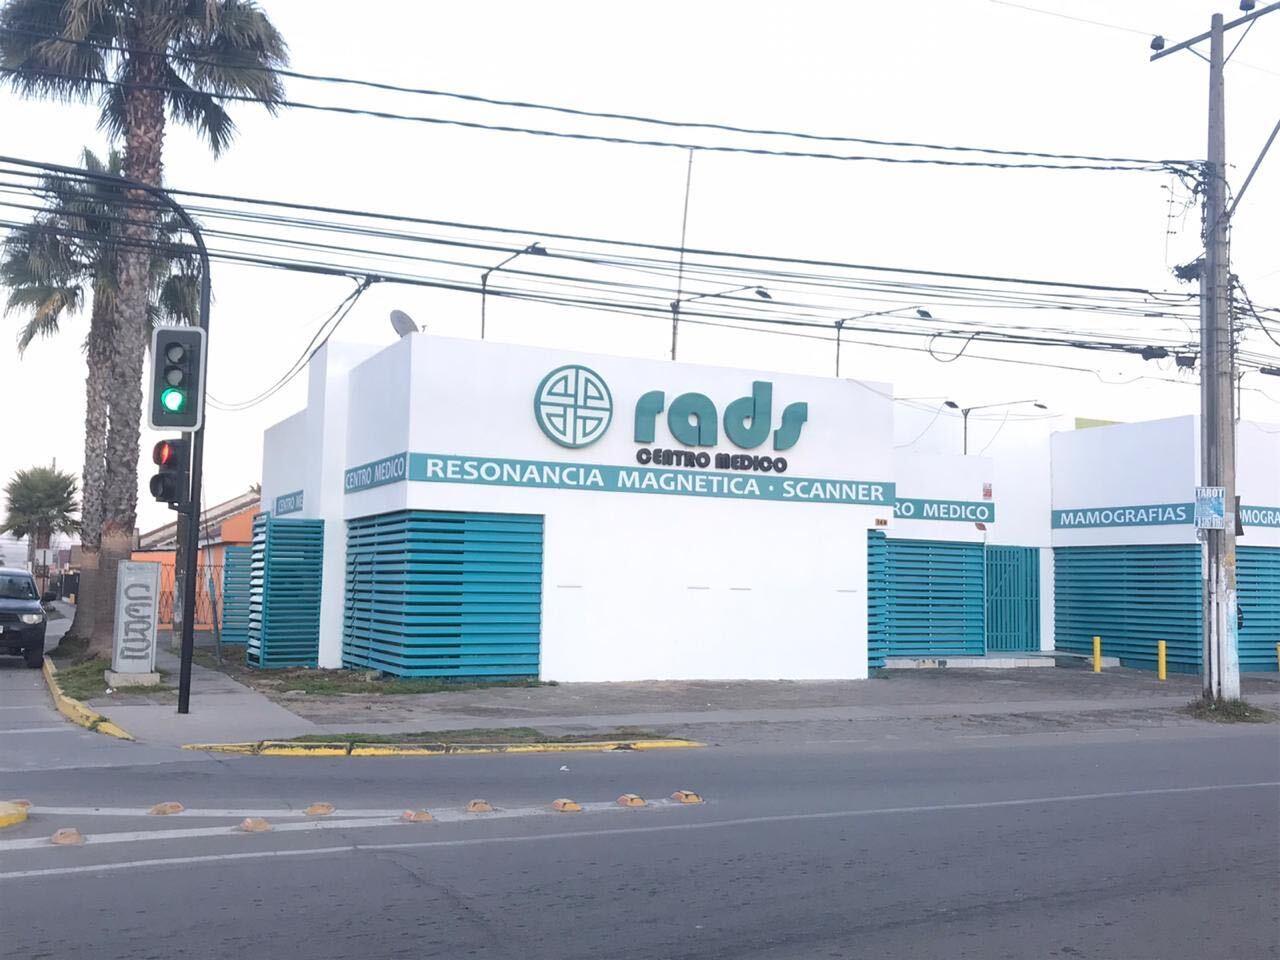 Sala Toma De Muestras El Llano - Coquimbo